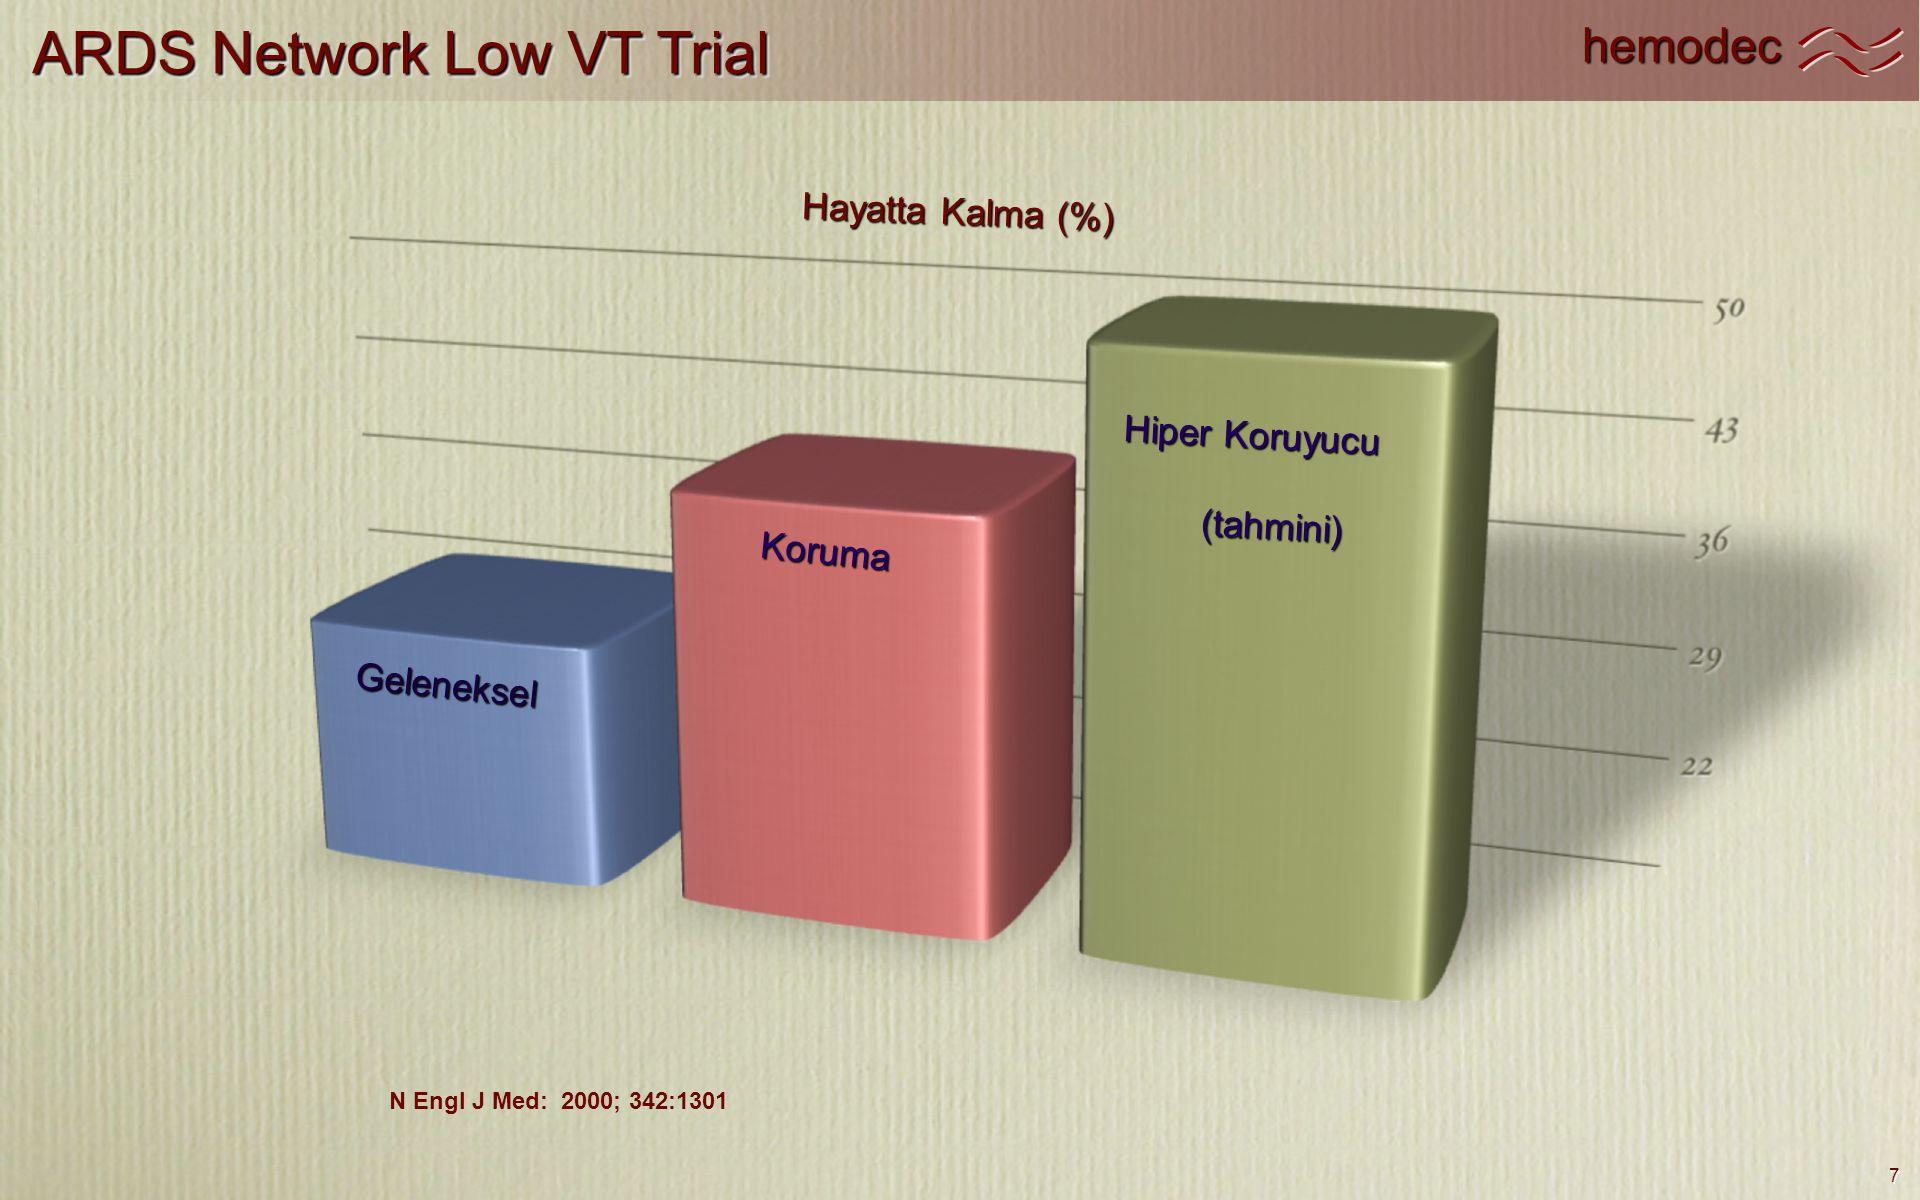 hemodec 7 ARDS Network Low VT Trial N Engl J Med: 2000; 342:1301 Hayatta Kalma (%) Geleneksel Koruma Hiper Koruyucu (tahmini)